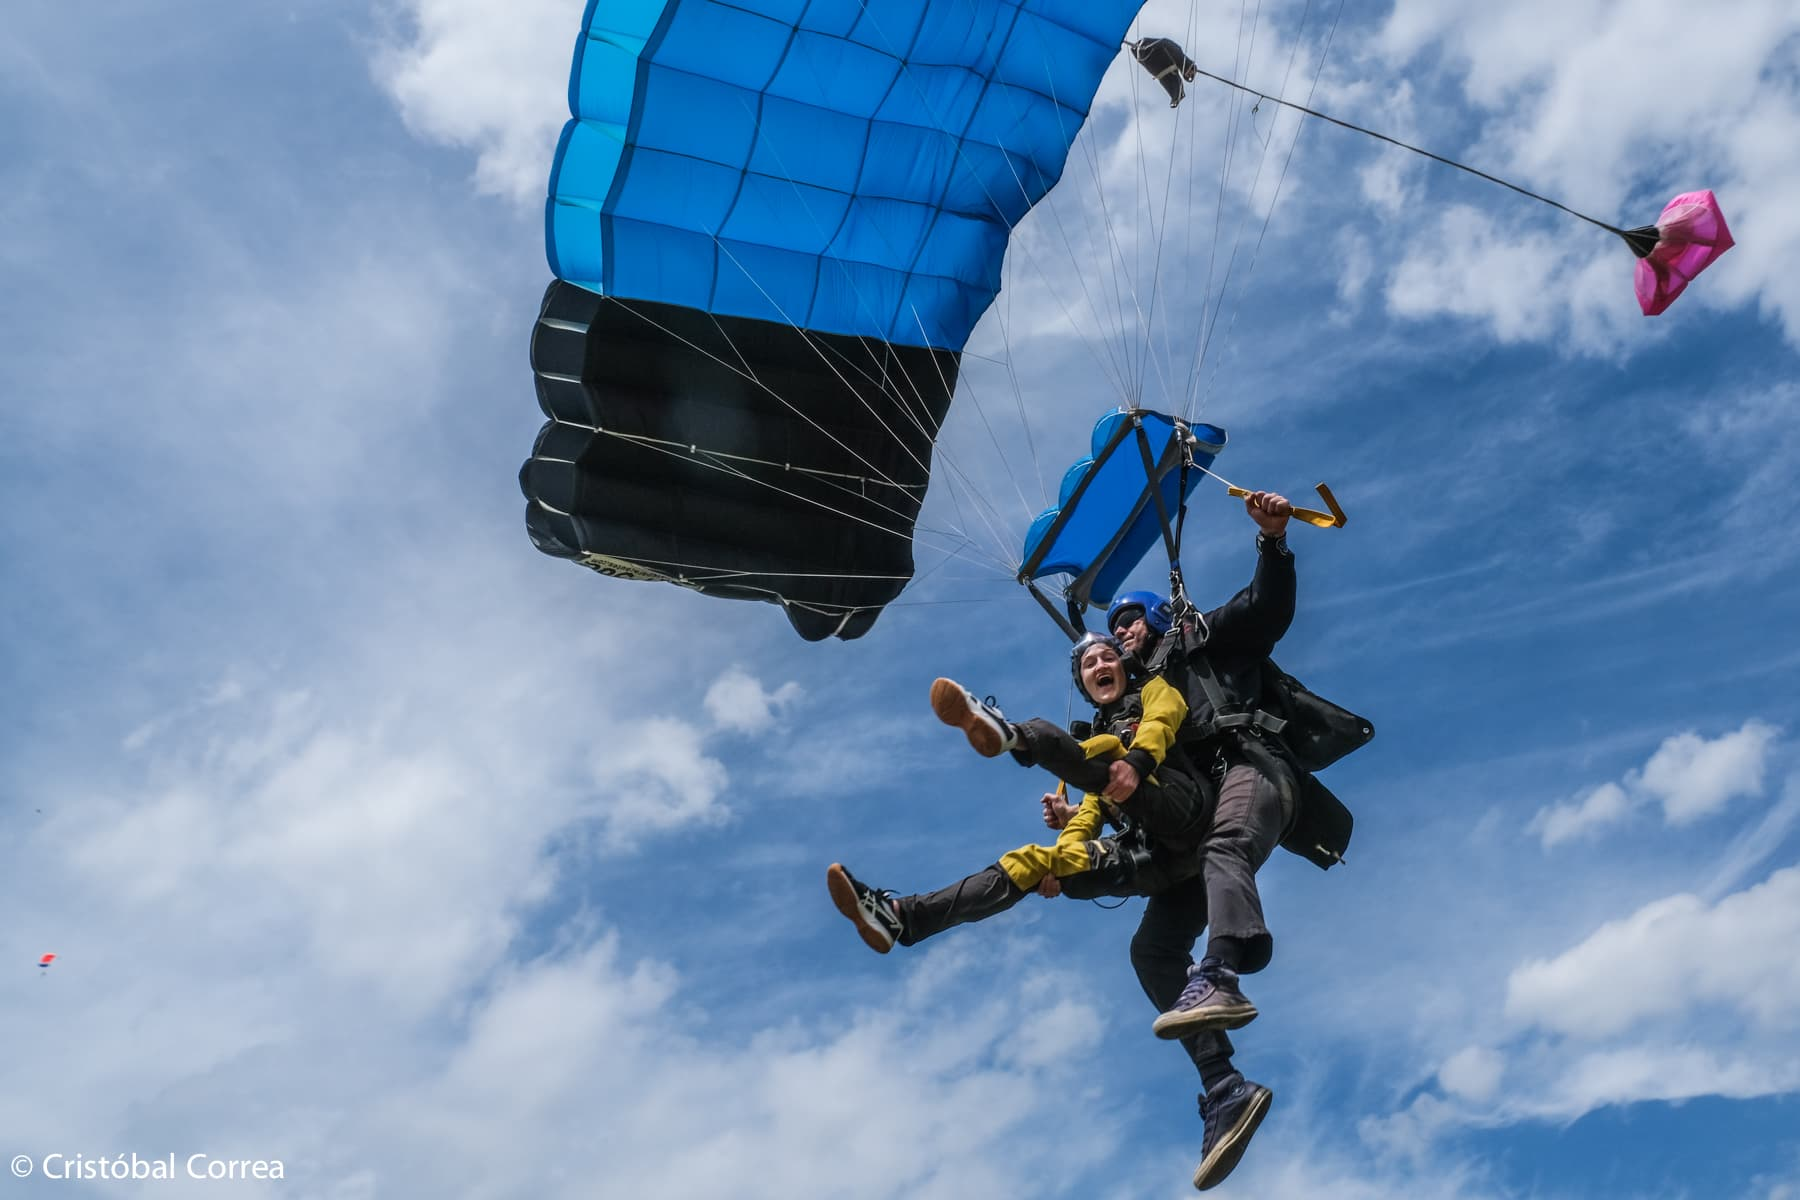 skydive landing tips tandem skydiving